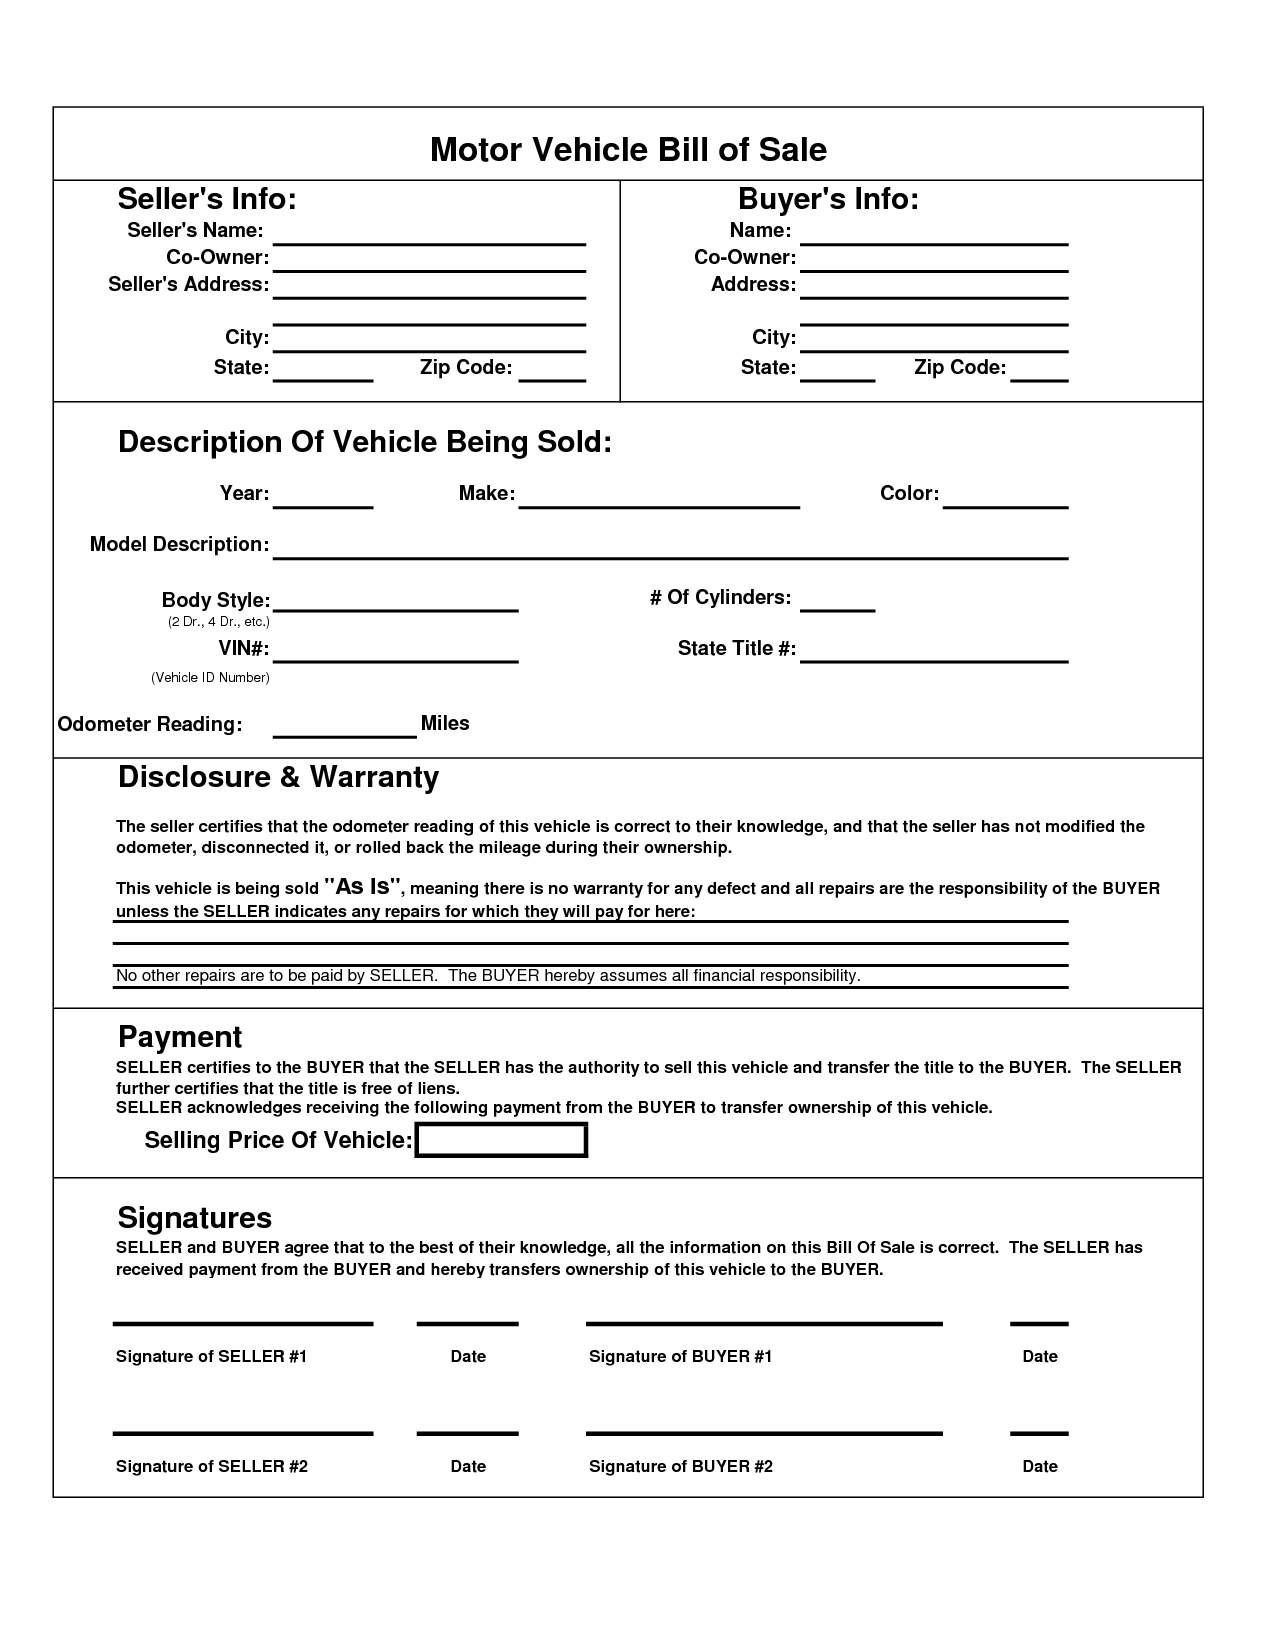 Printable Car Bill Of Sale Pdf | Bill Of Sale For Motor Vehicle - Free Printable Vehicle Bill Of Sale